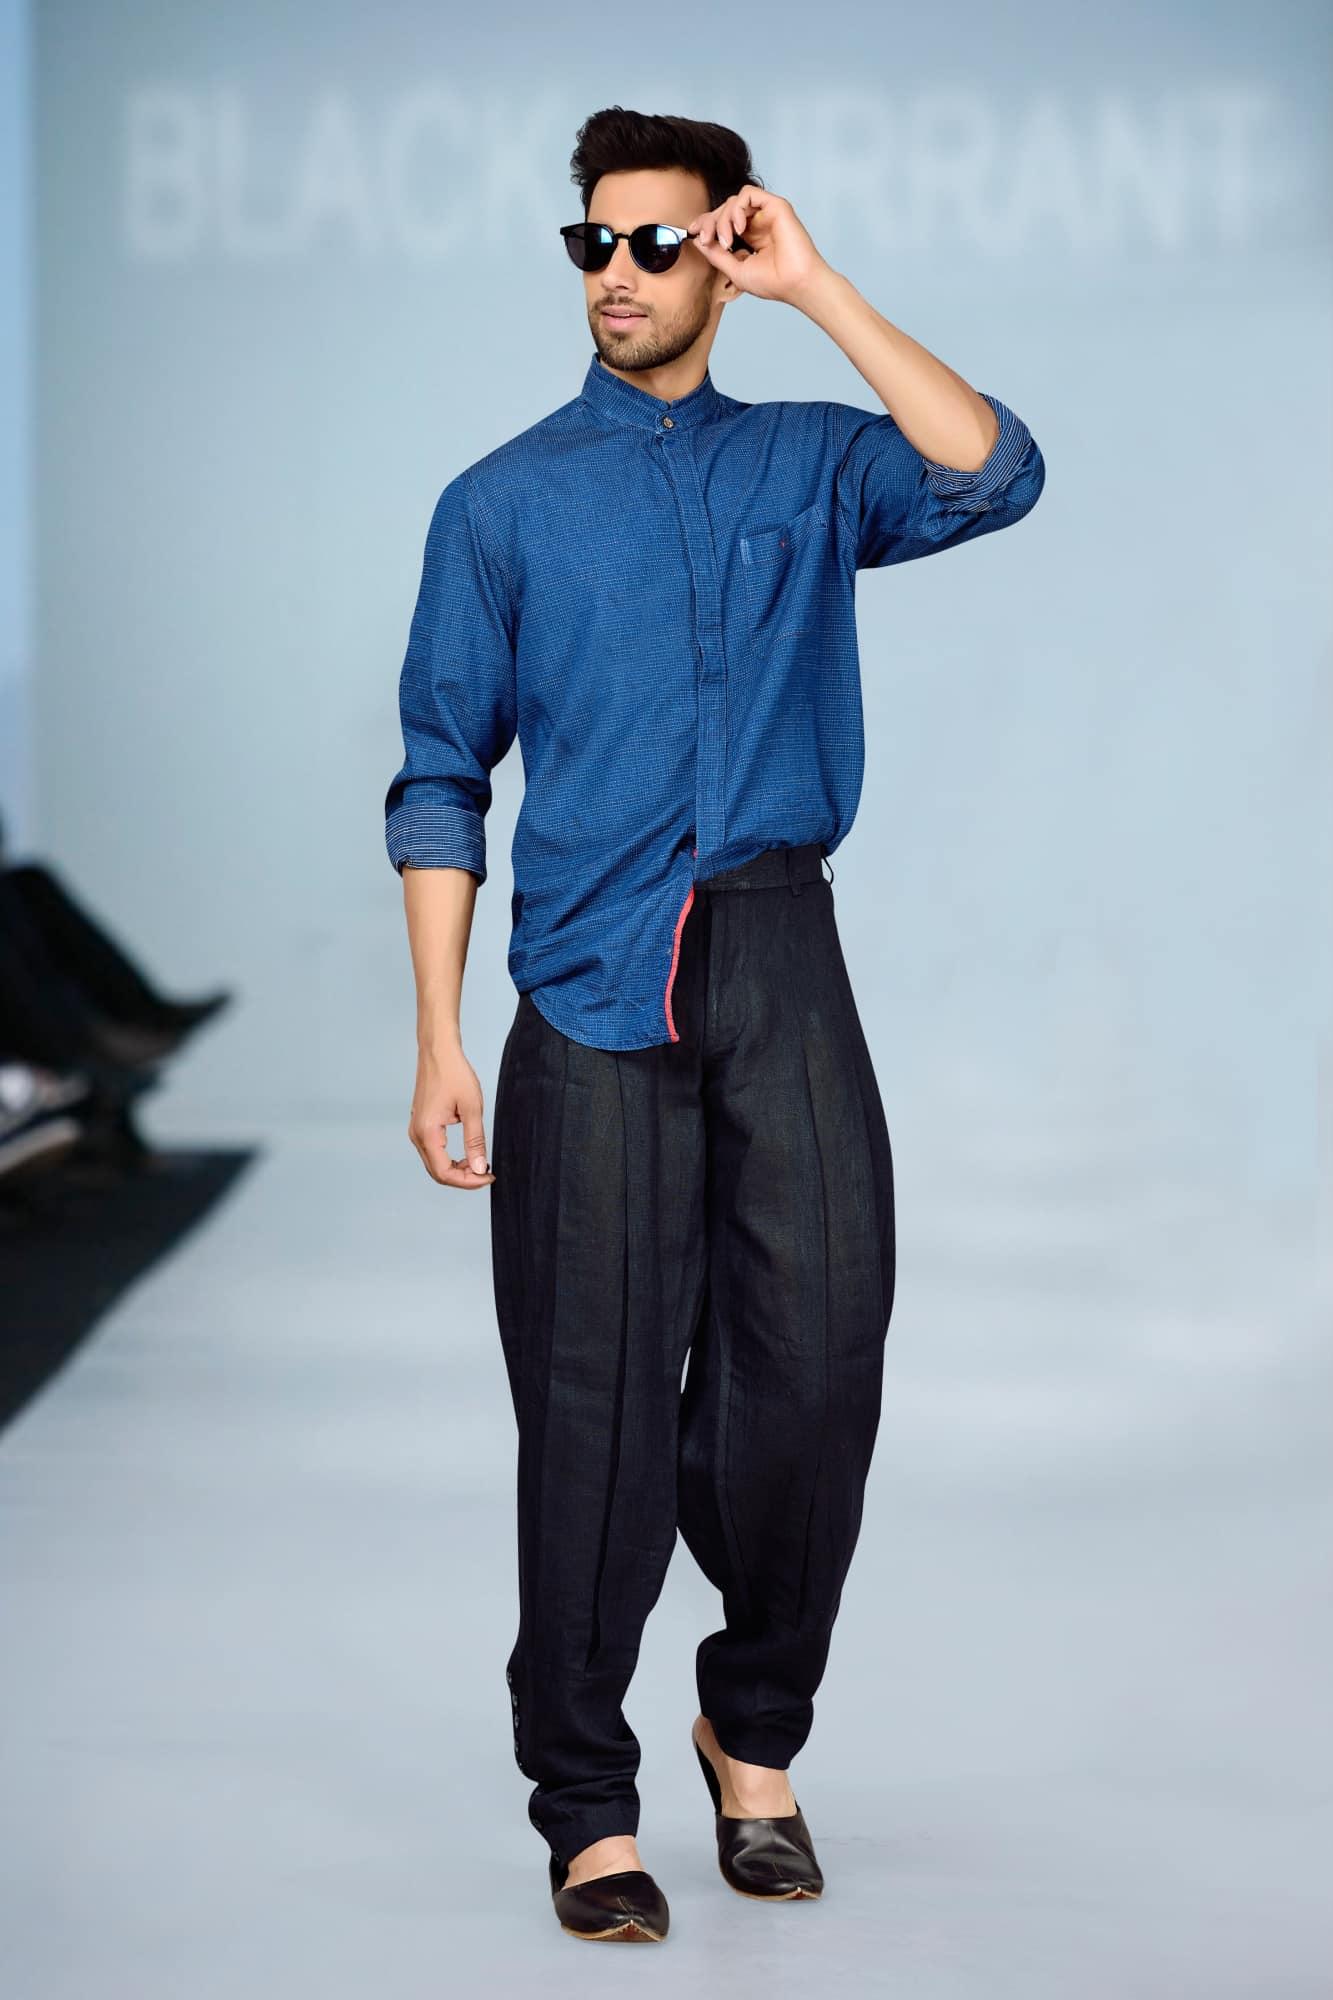 BlackCurrant, Colaba - Fashion Designers in Mumbai - Justdial